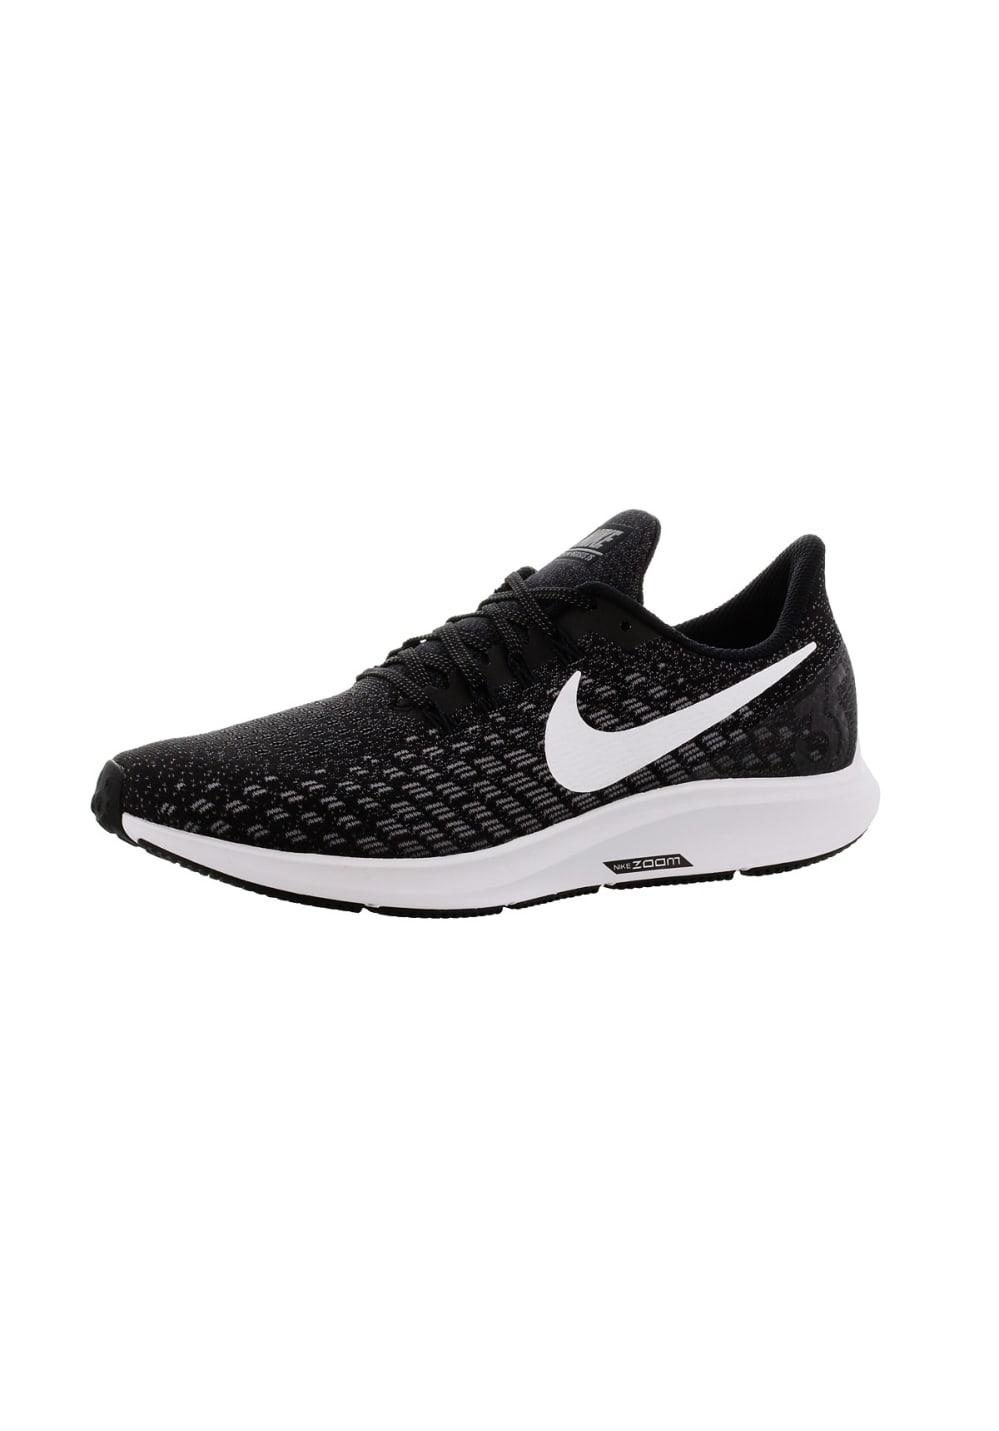 Nike Air Zoom Pegasus 35 - Laufschuhe für Damen - Schwarz